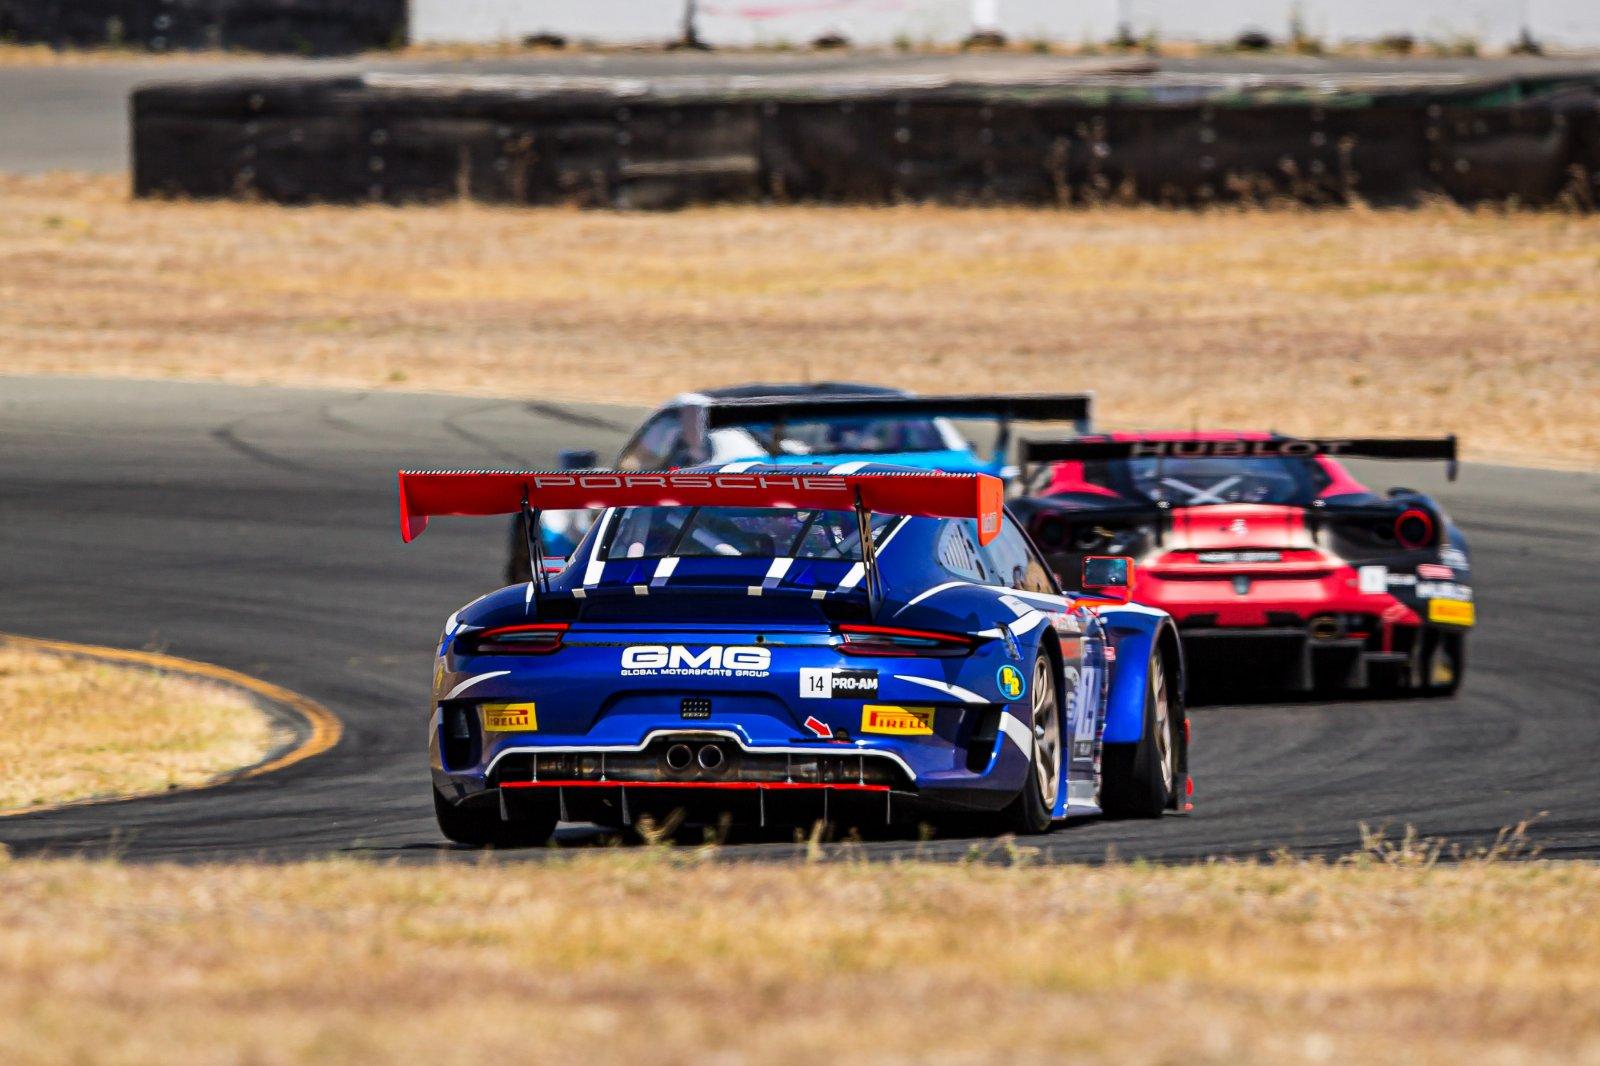 #14 Porsche 911 GT3 of James Sofronas and Jeroen Bleekemolen, GMG Racing, GT3 Pro-Am, 2020 SRO Motorsports Group - Sonoma Raceway, Sonoma CA